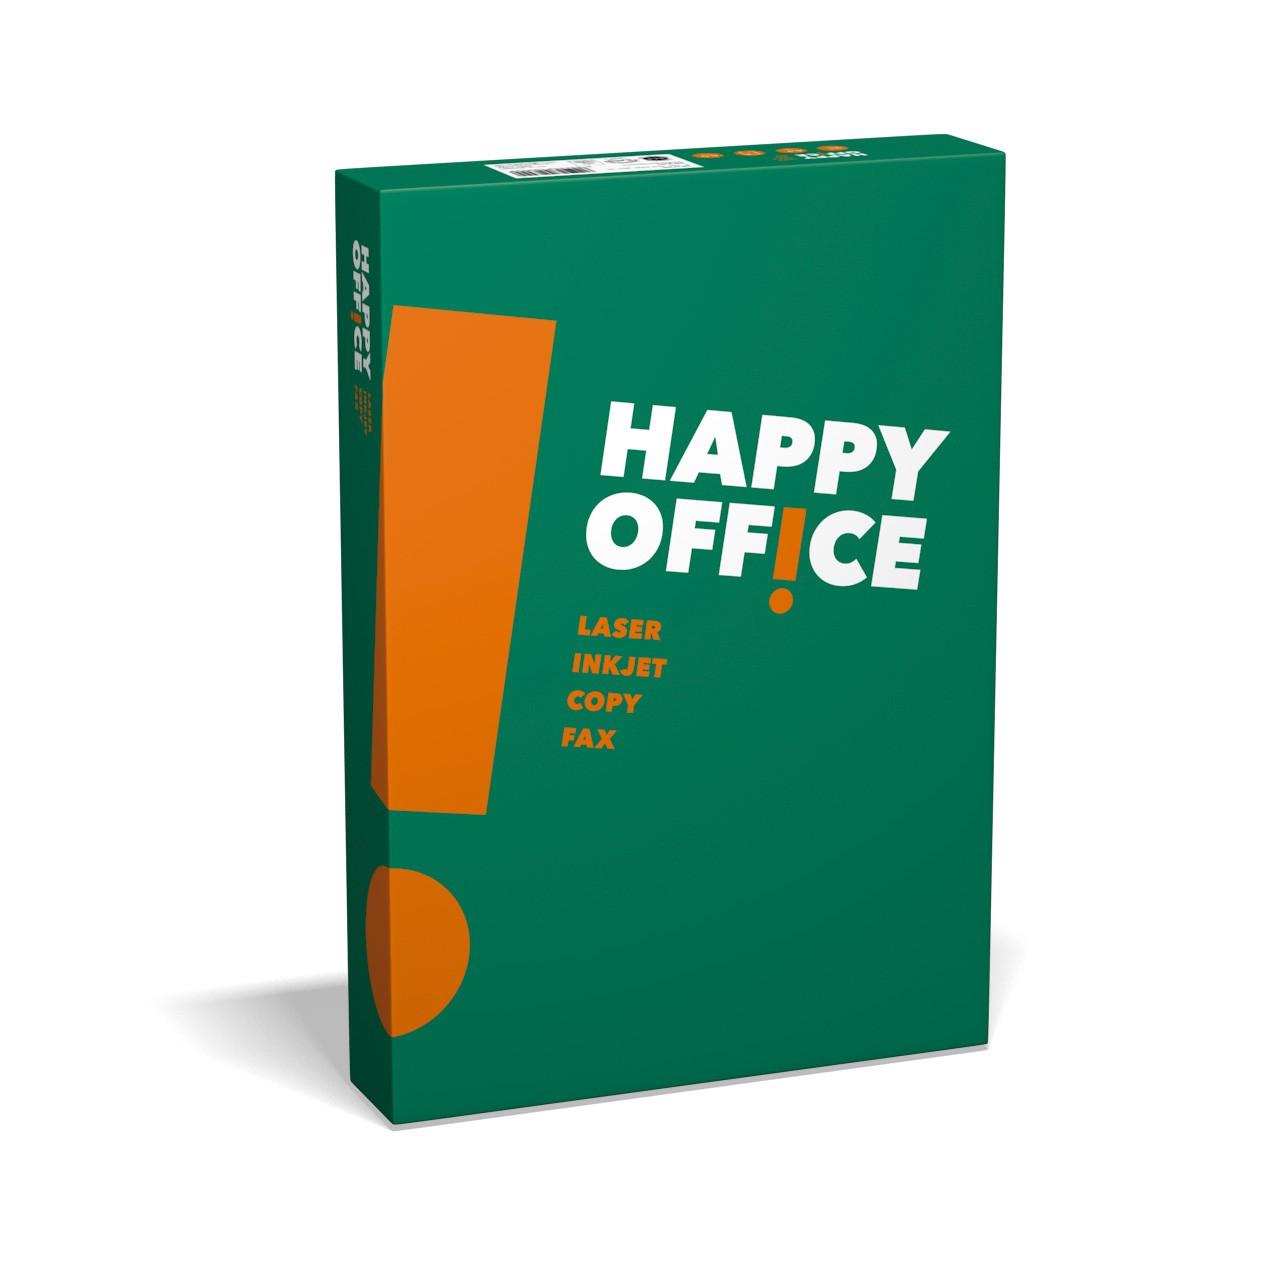 Bürotrend Bielefeld - Happy Office